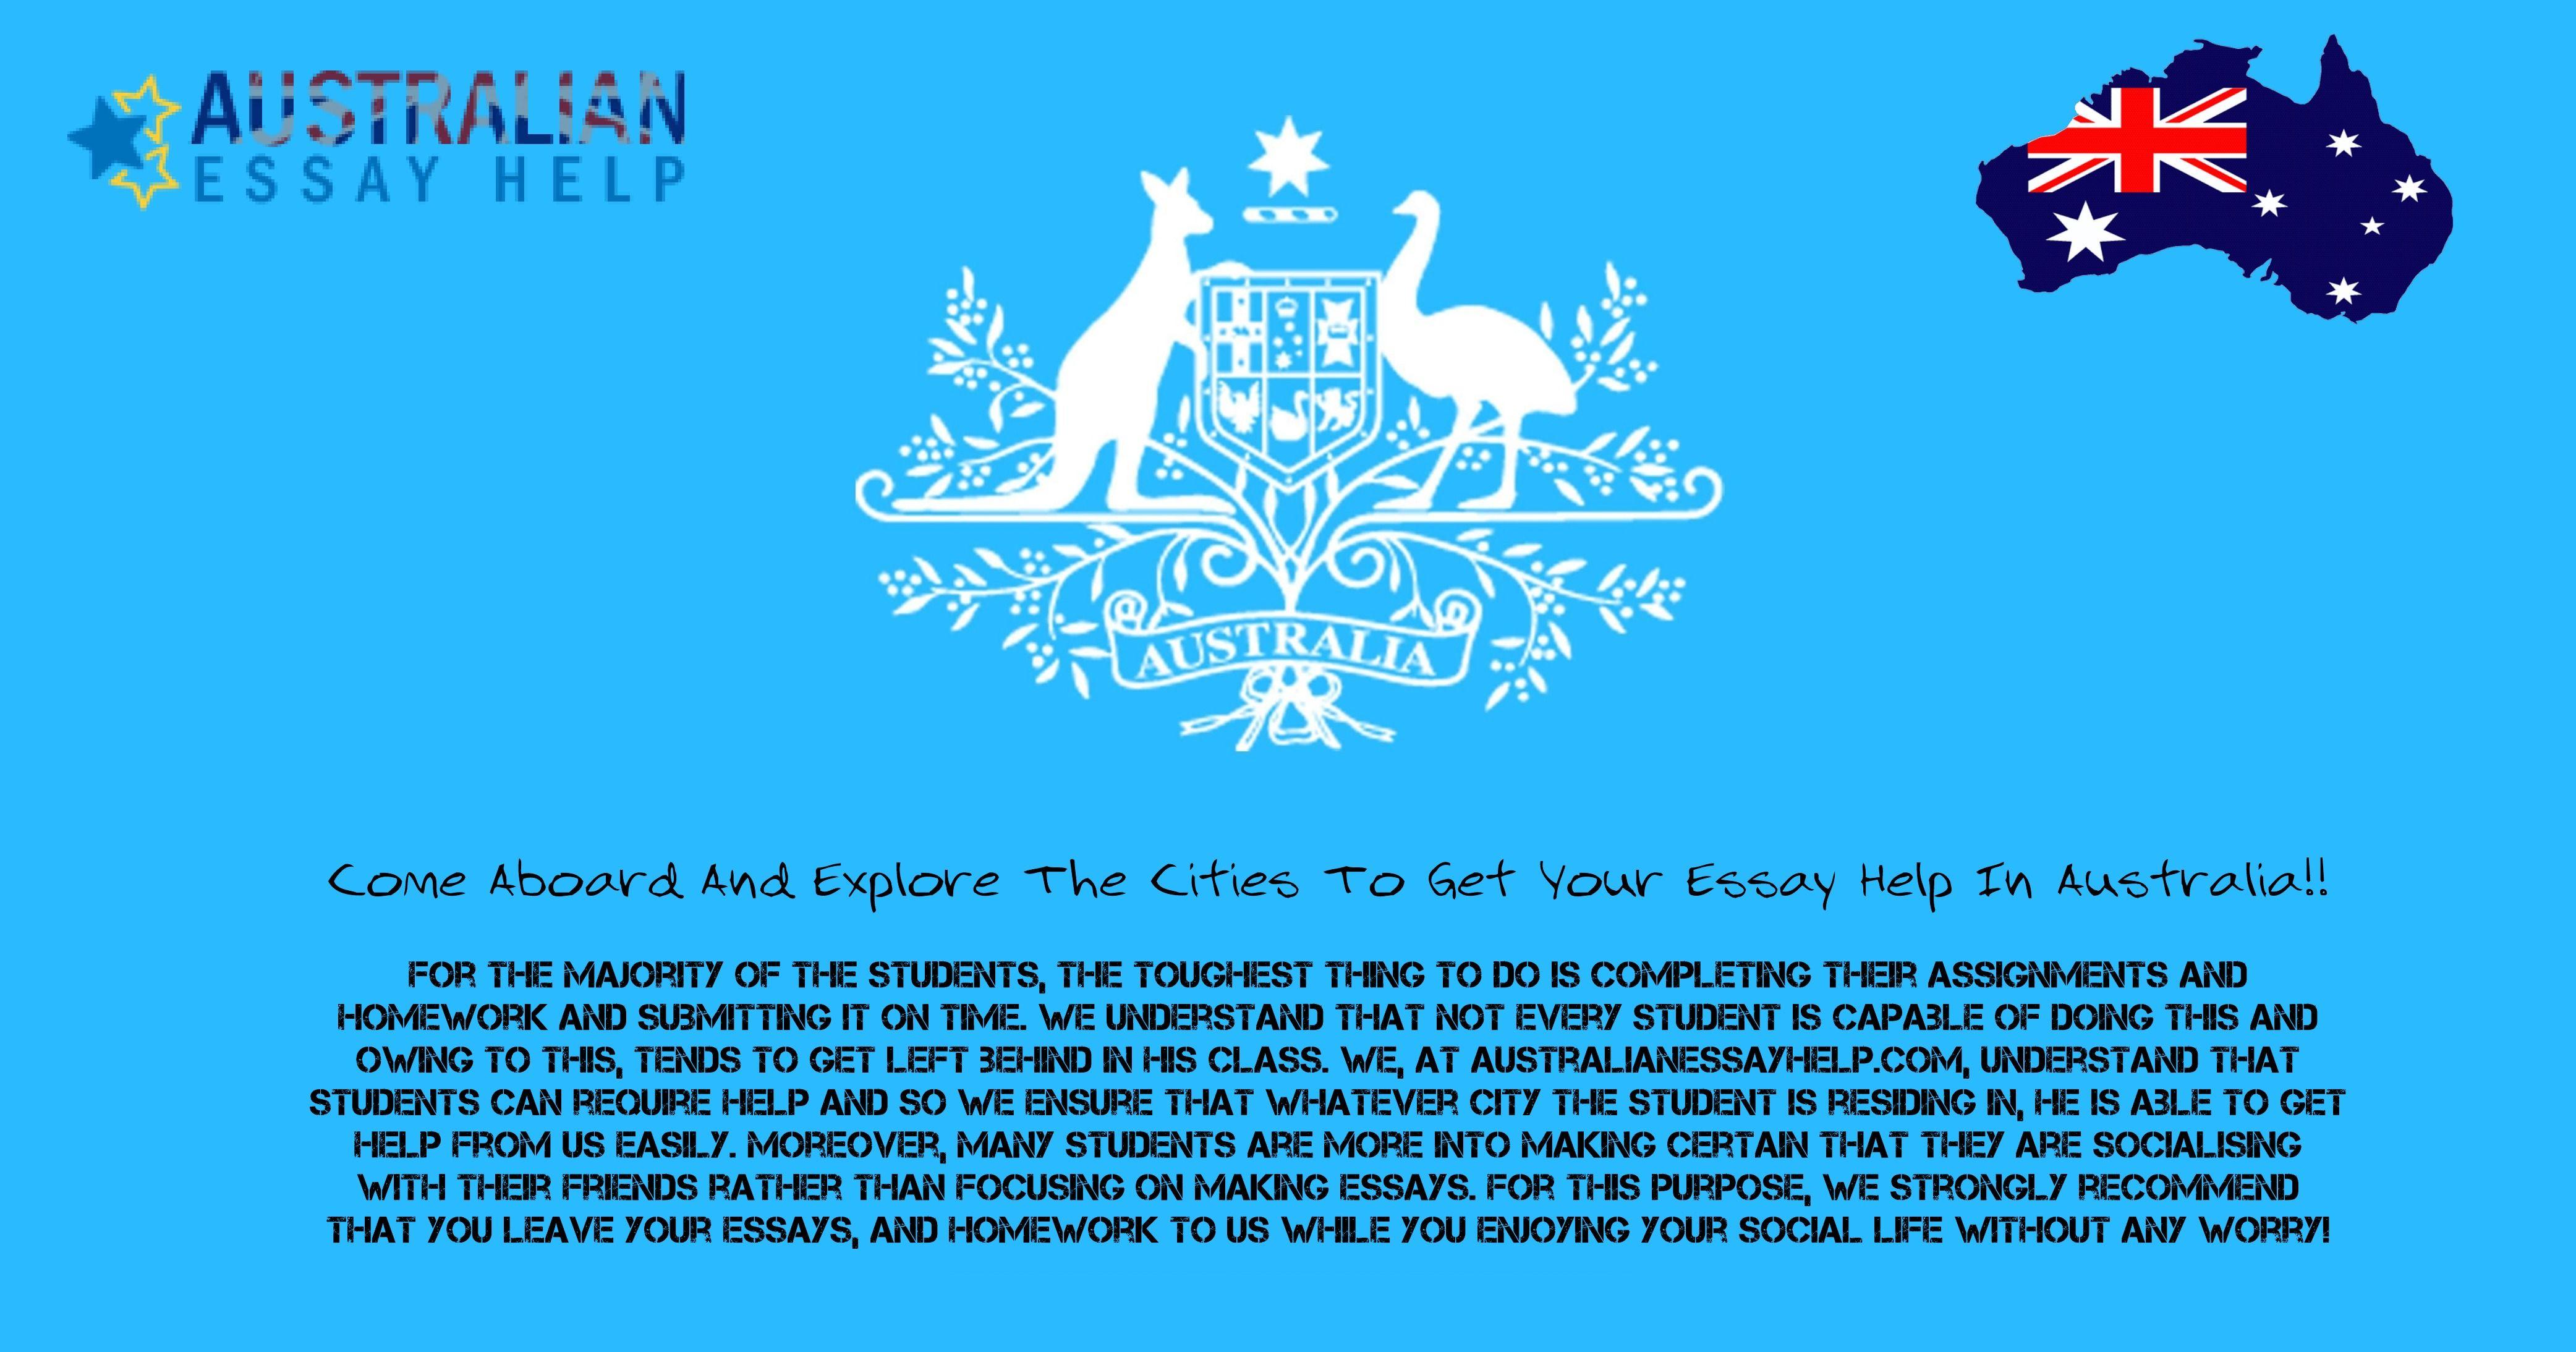 Essay Writing Australia - Professional Writing Services in Australia | blogger.com